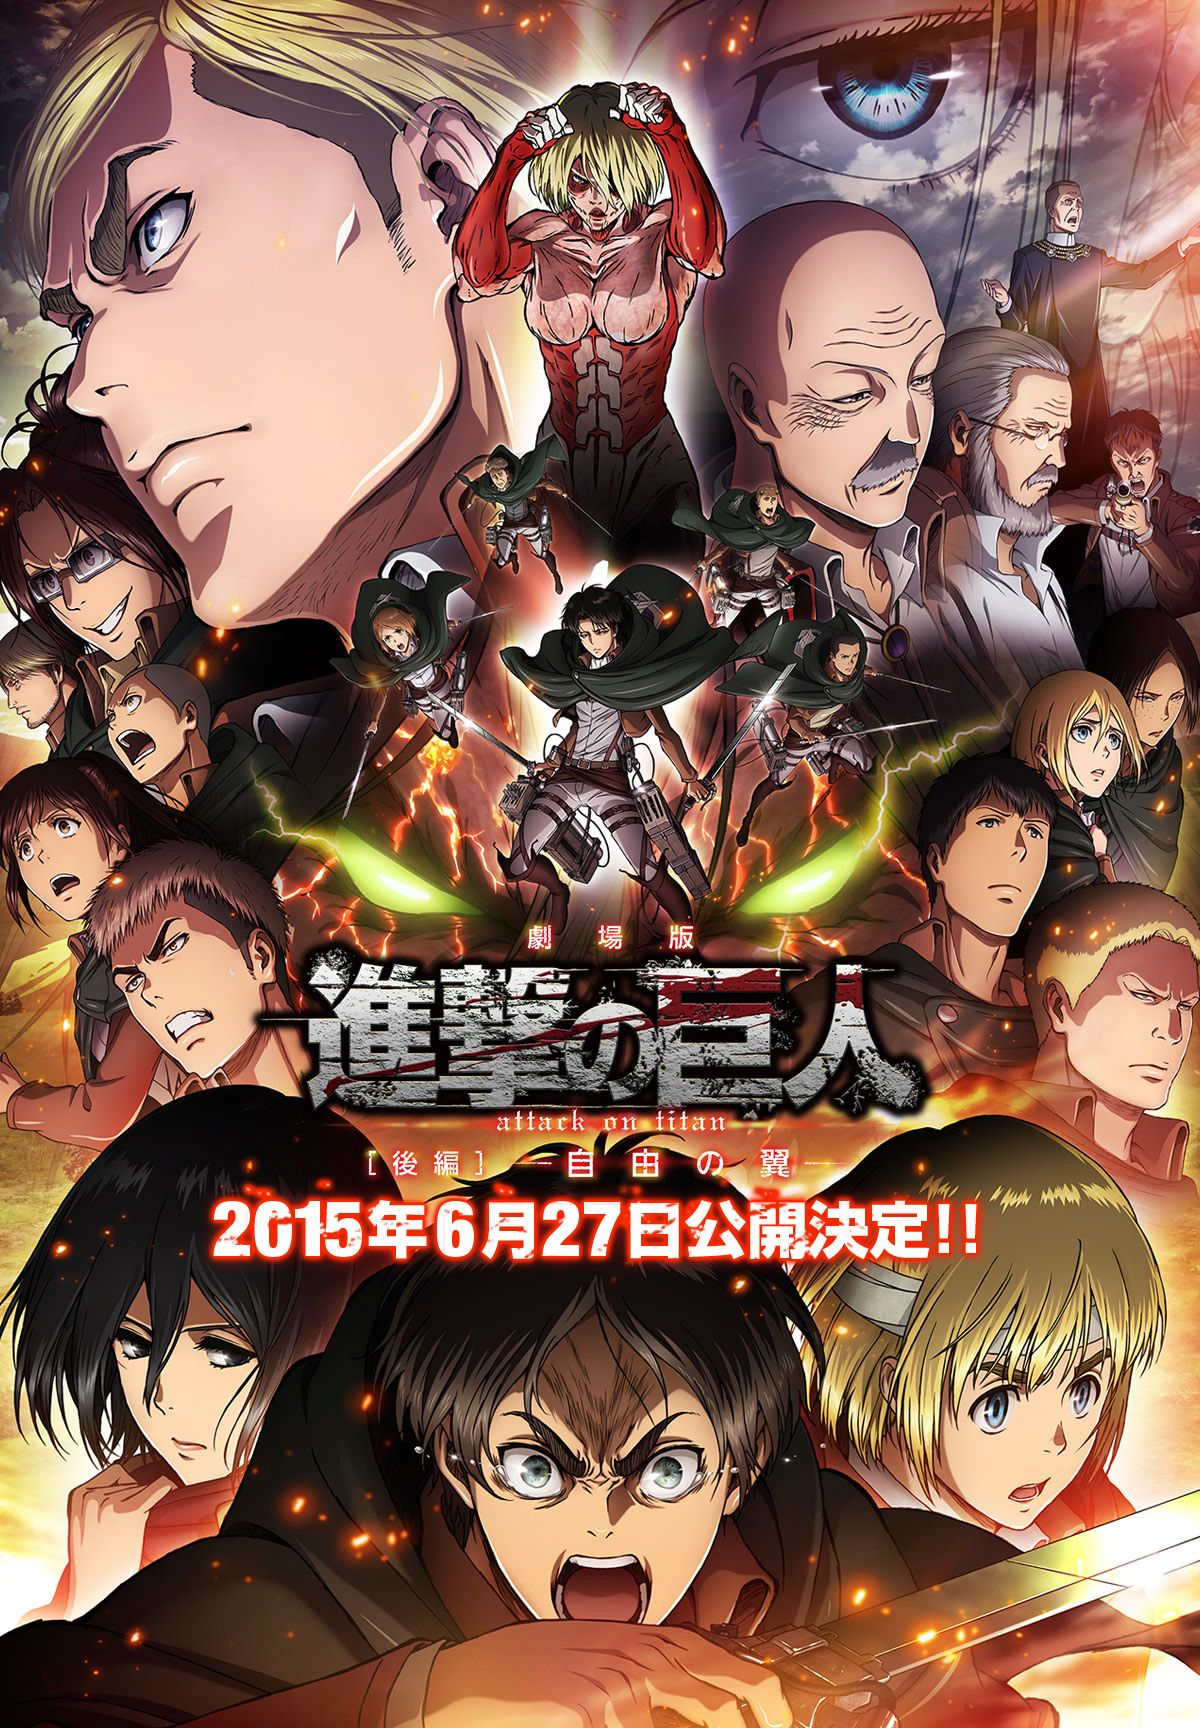 Anime Attack On Titan Part Ii Wings Of Freedom Movie S Key Visual Unveiled Attack On Titan Seni Anime Gambar Anime